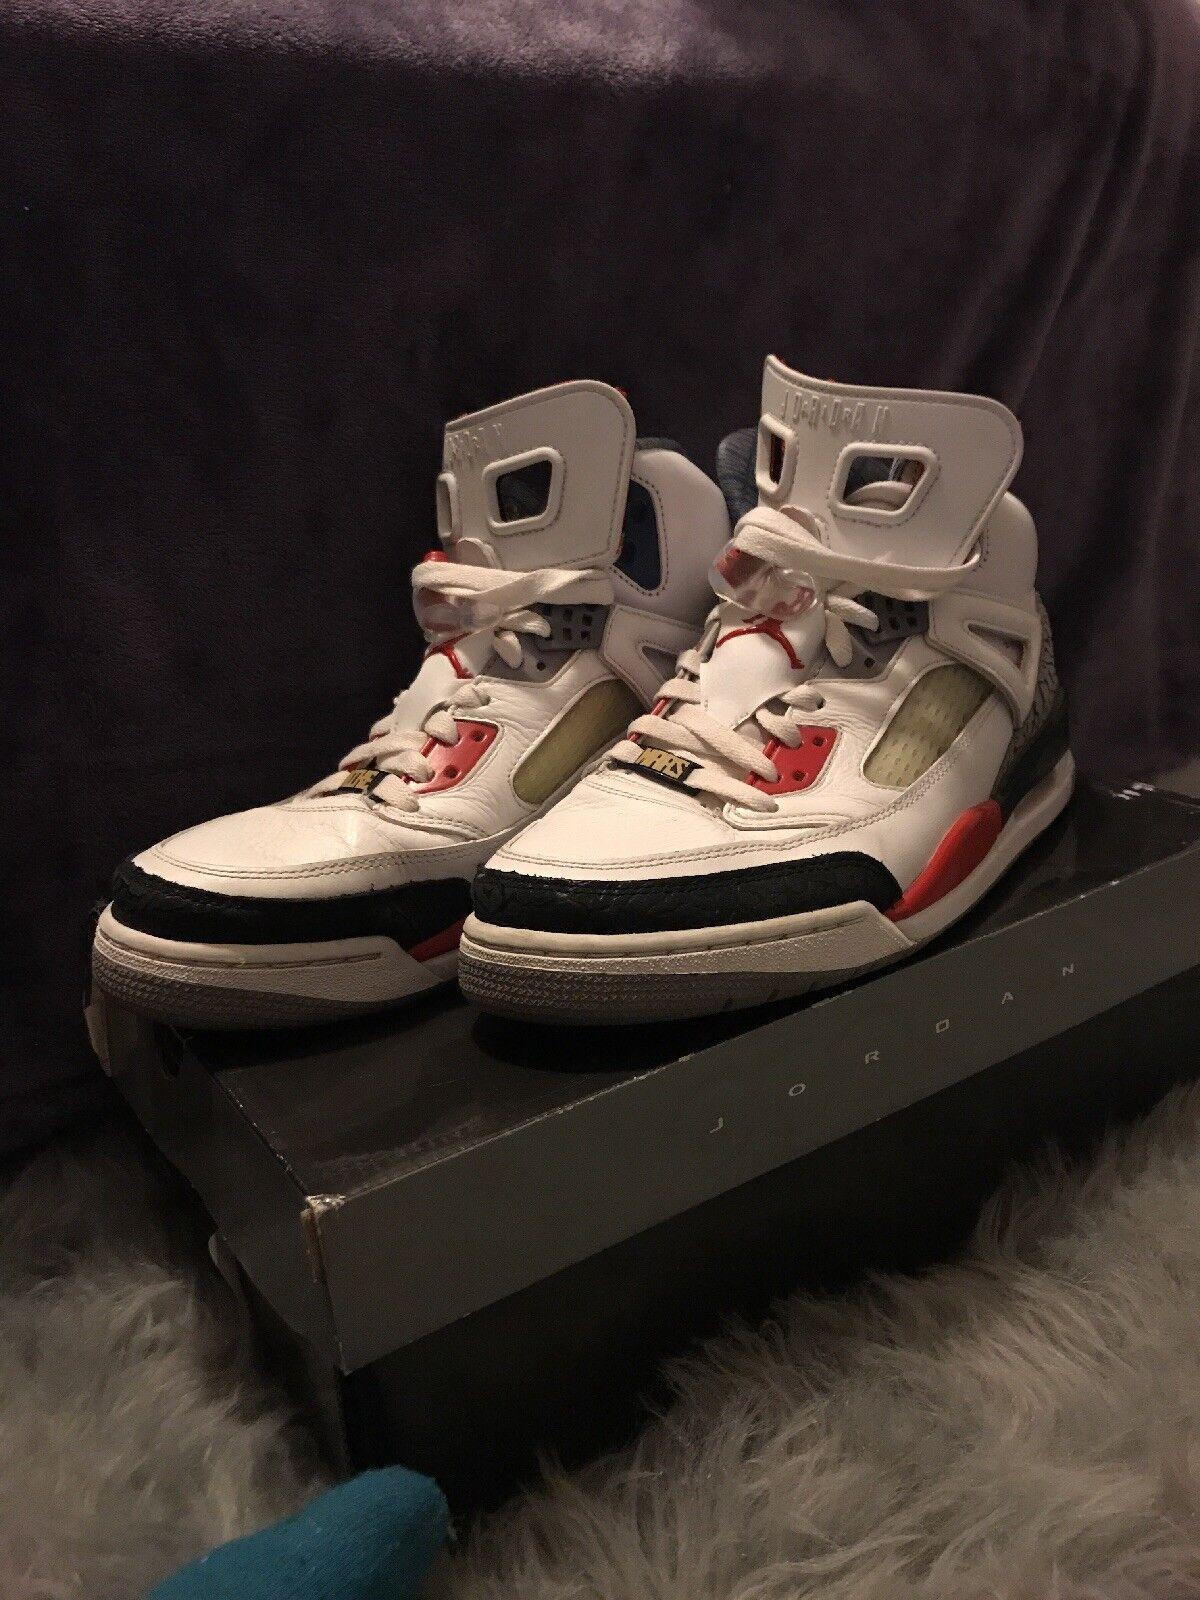 Jordan spizike size 9.5  Cheap and fashionable